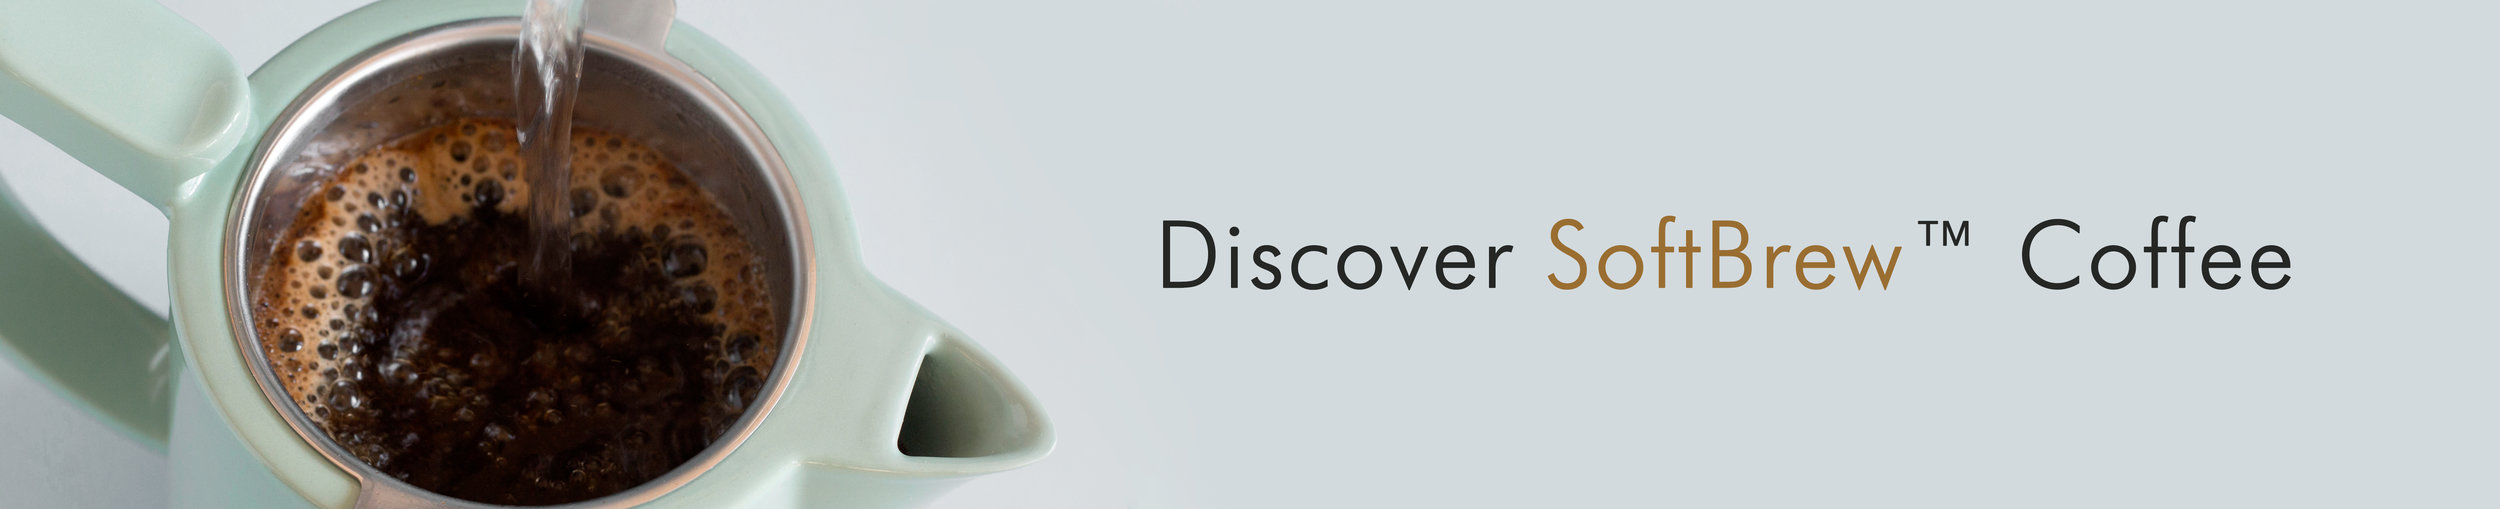 discover-softbrew-COFFEE.jpg